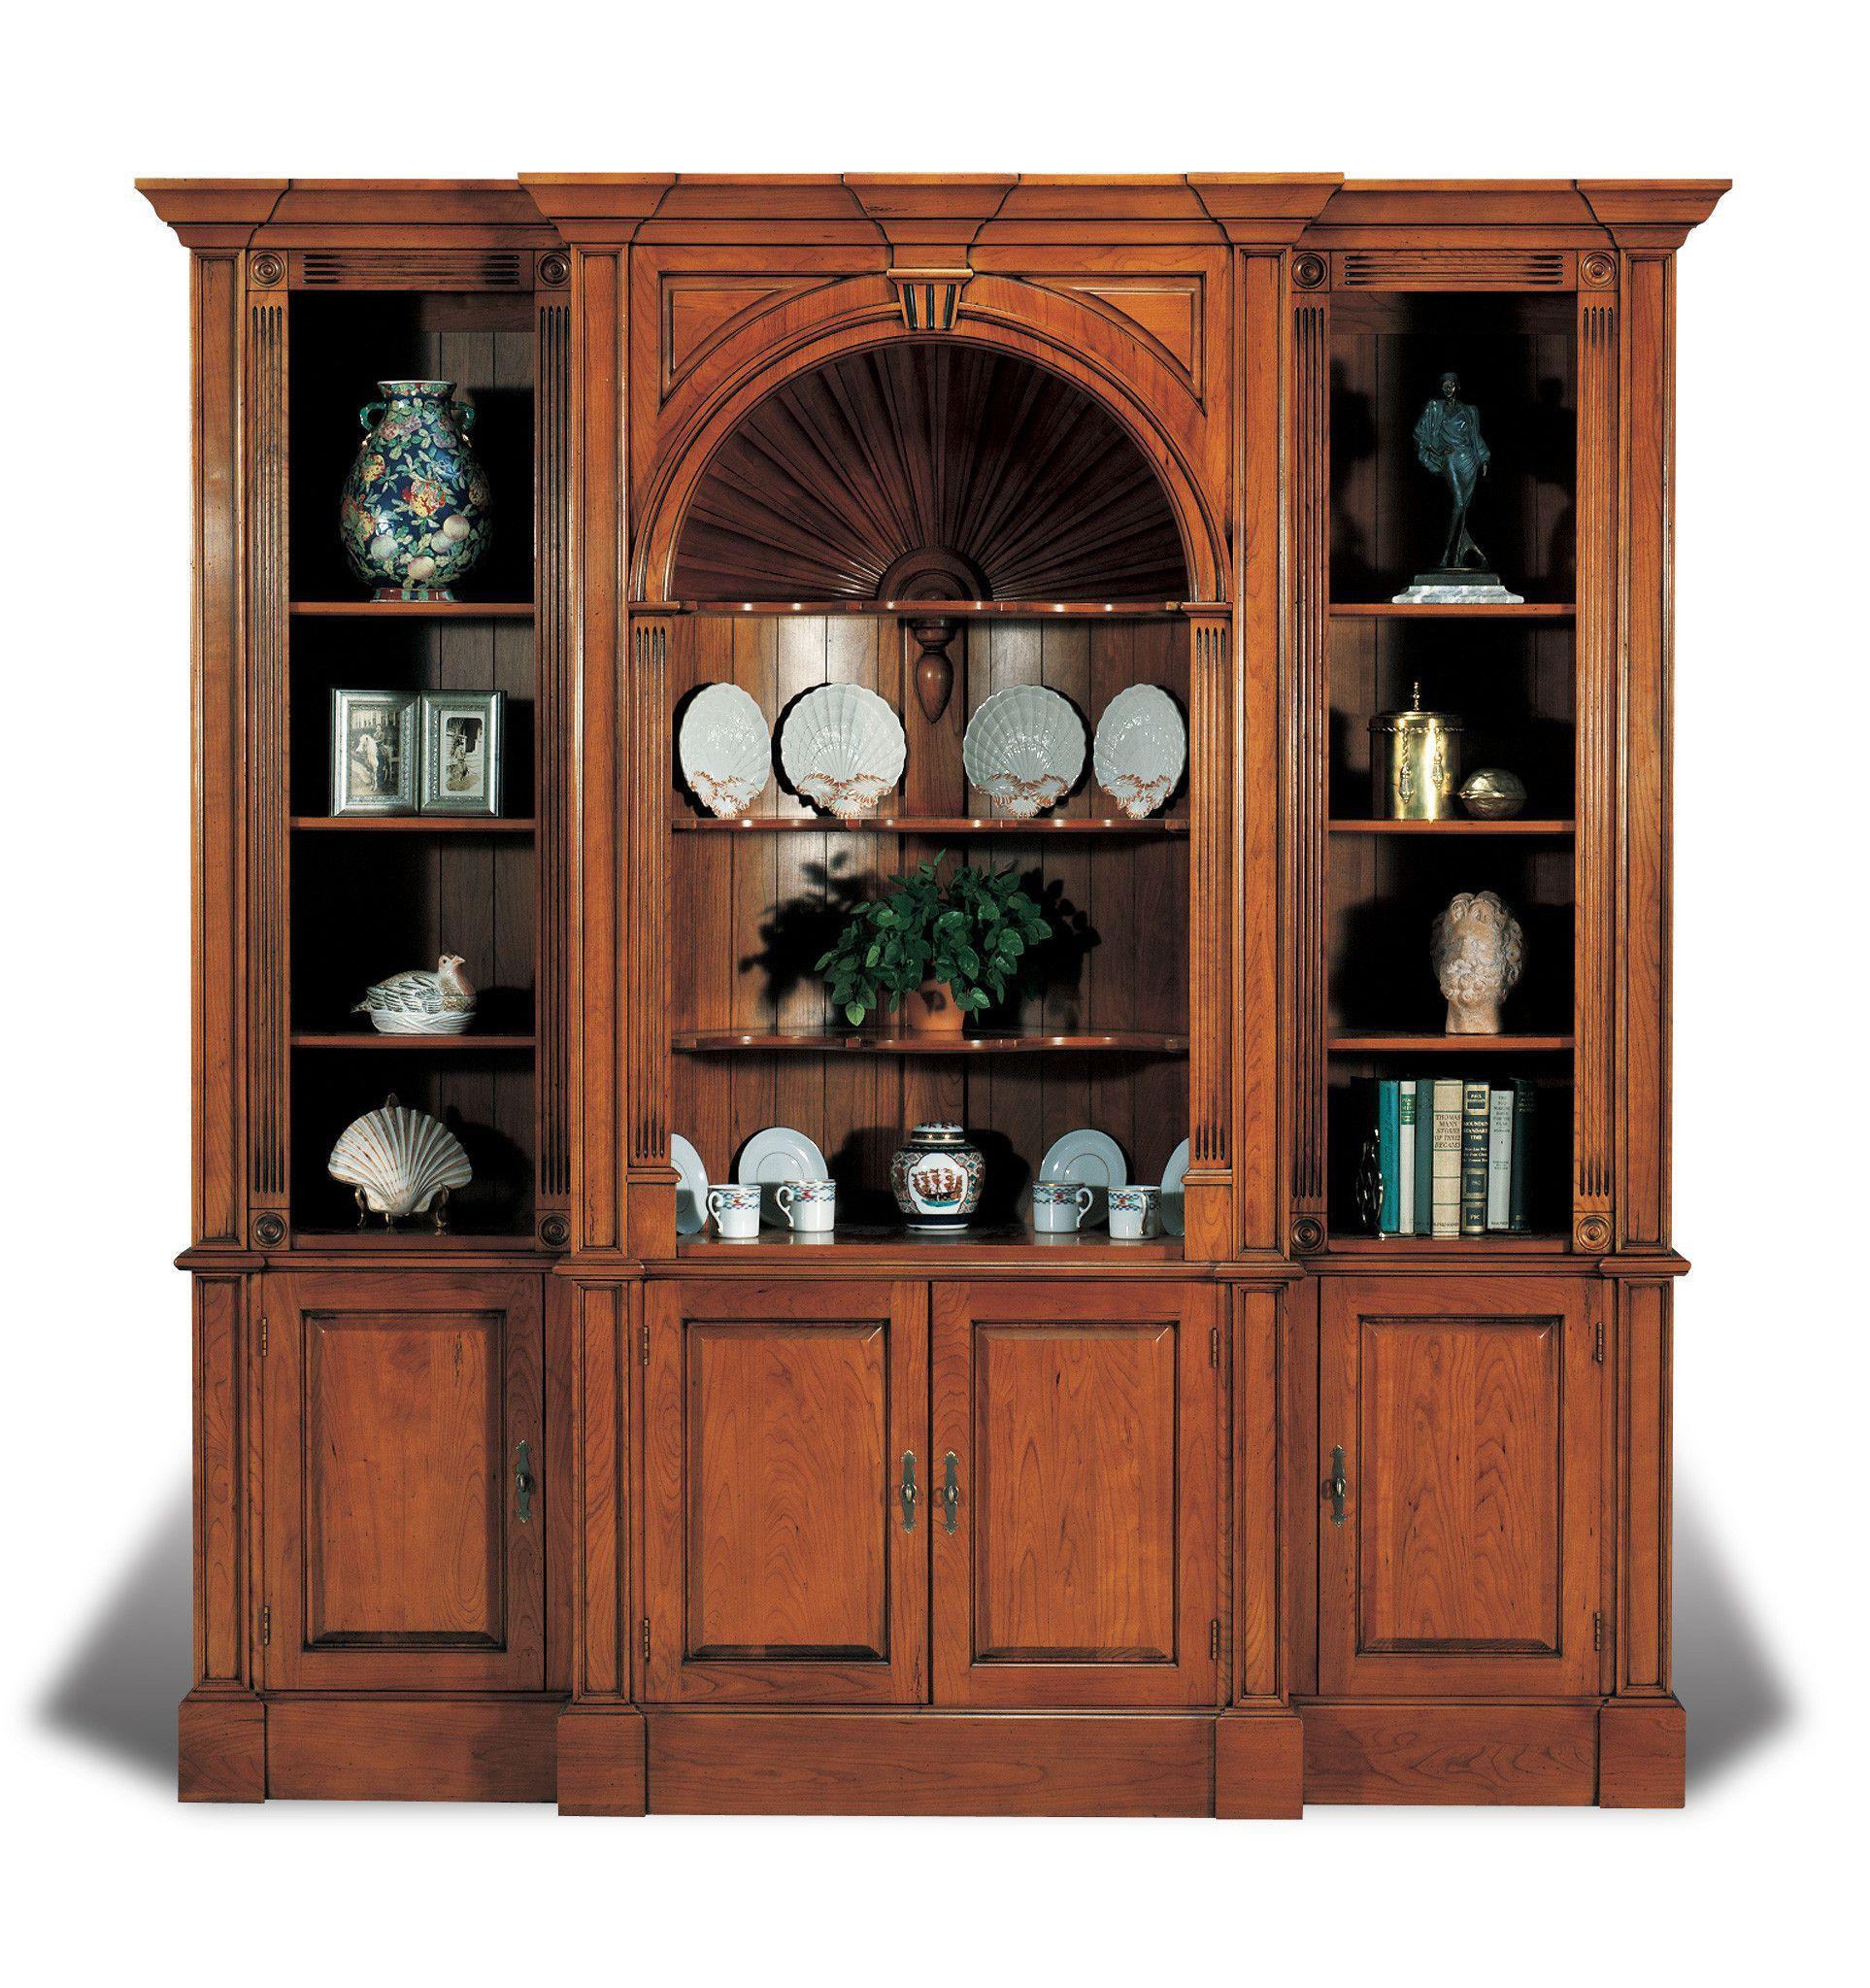 with doors dylan walsh tasmanian custom glass library oak cabinet project